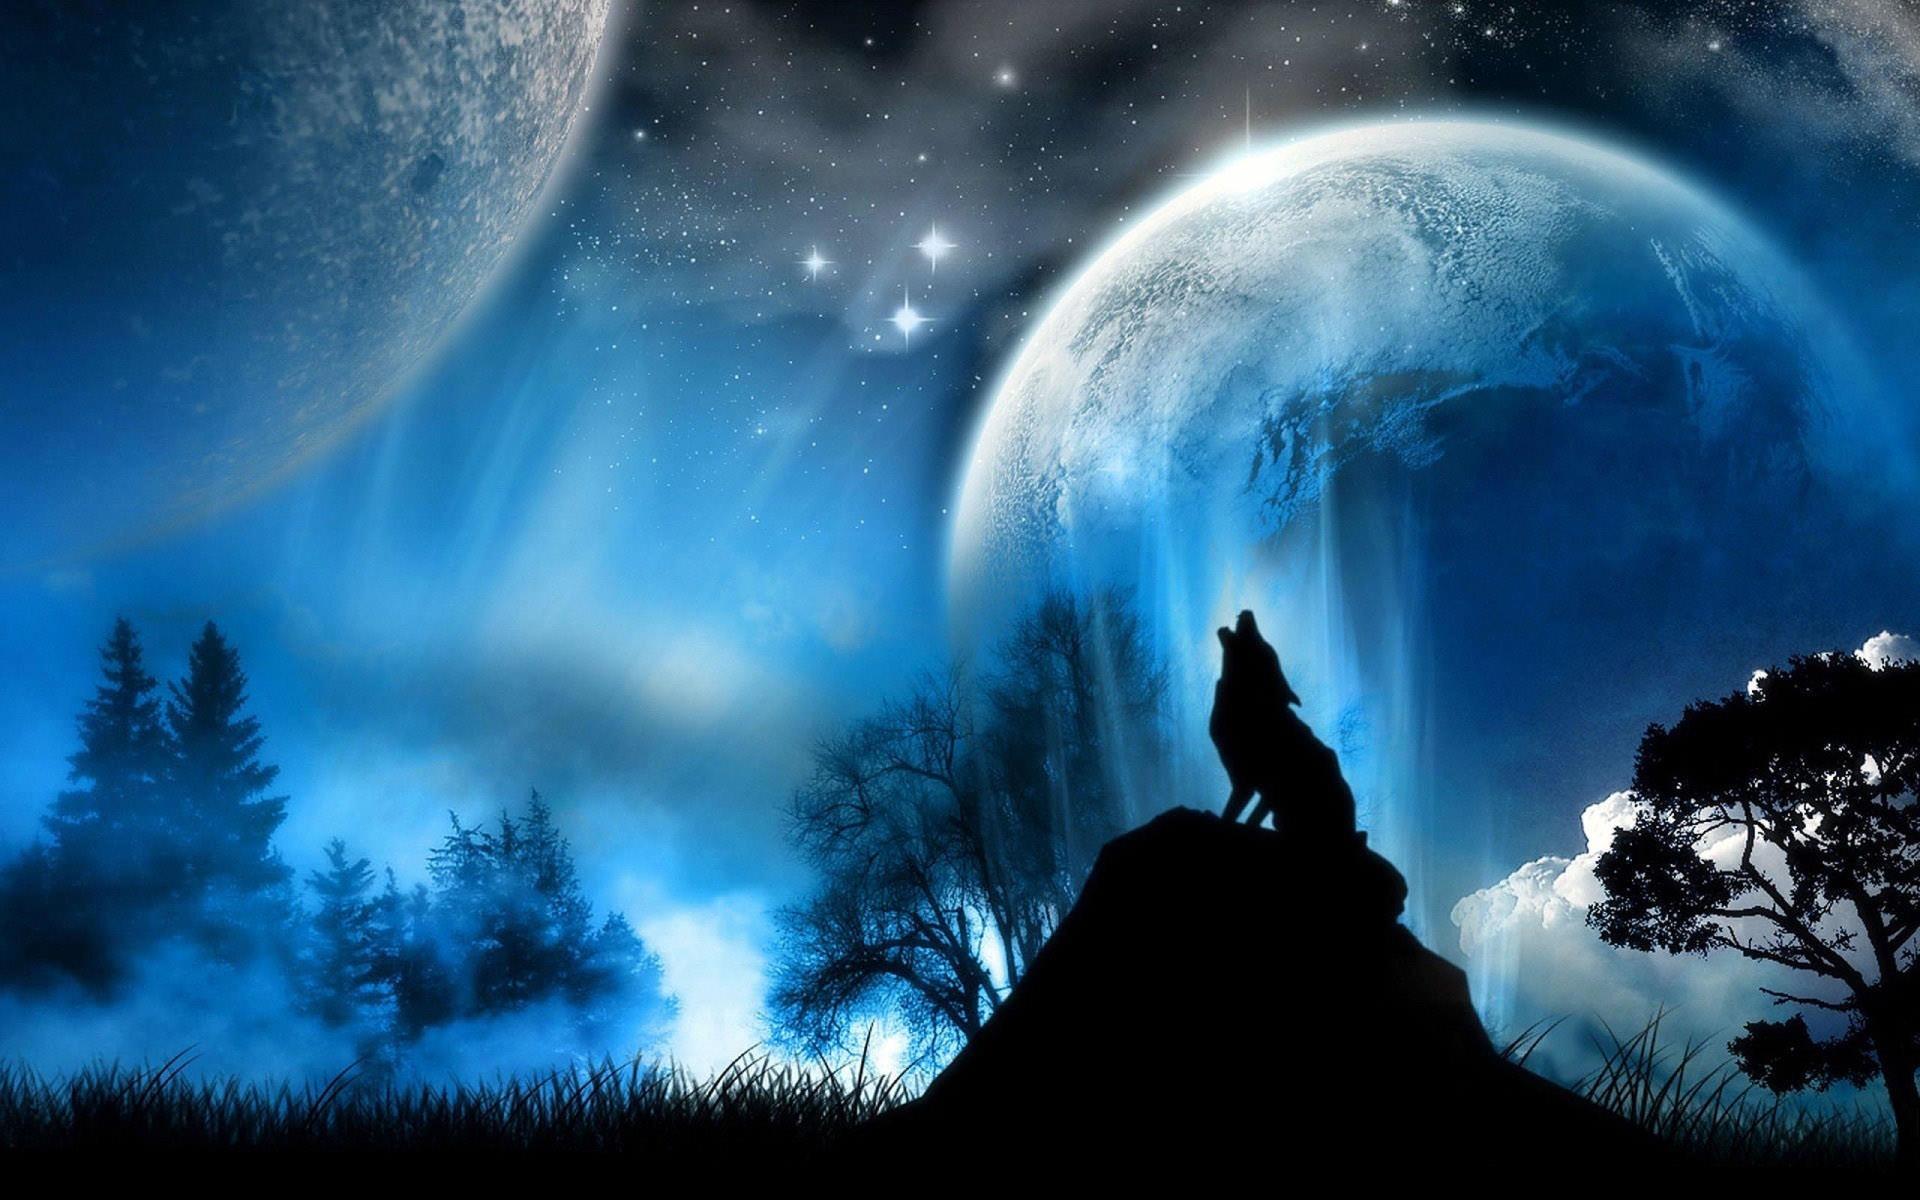 Cool Moon Wallpaper for Desktop moon-cool-pictures-for-desktop-background- best-wallpaper-